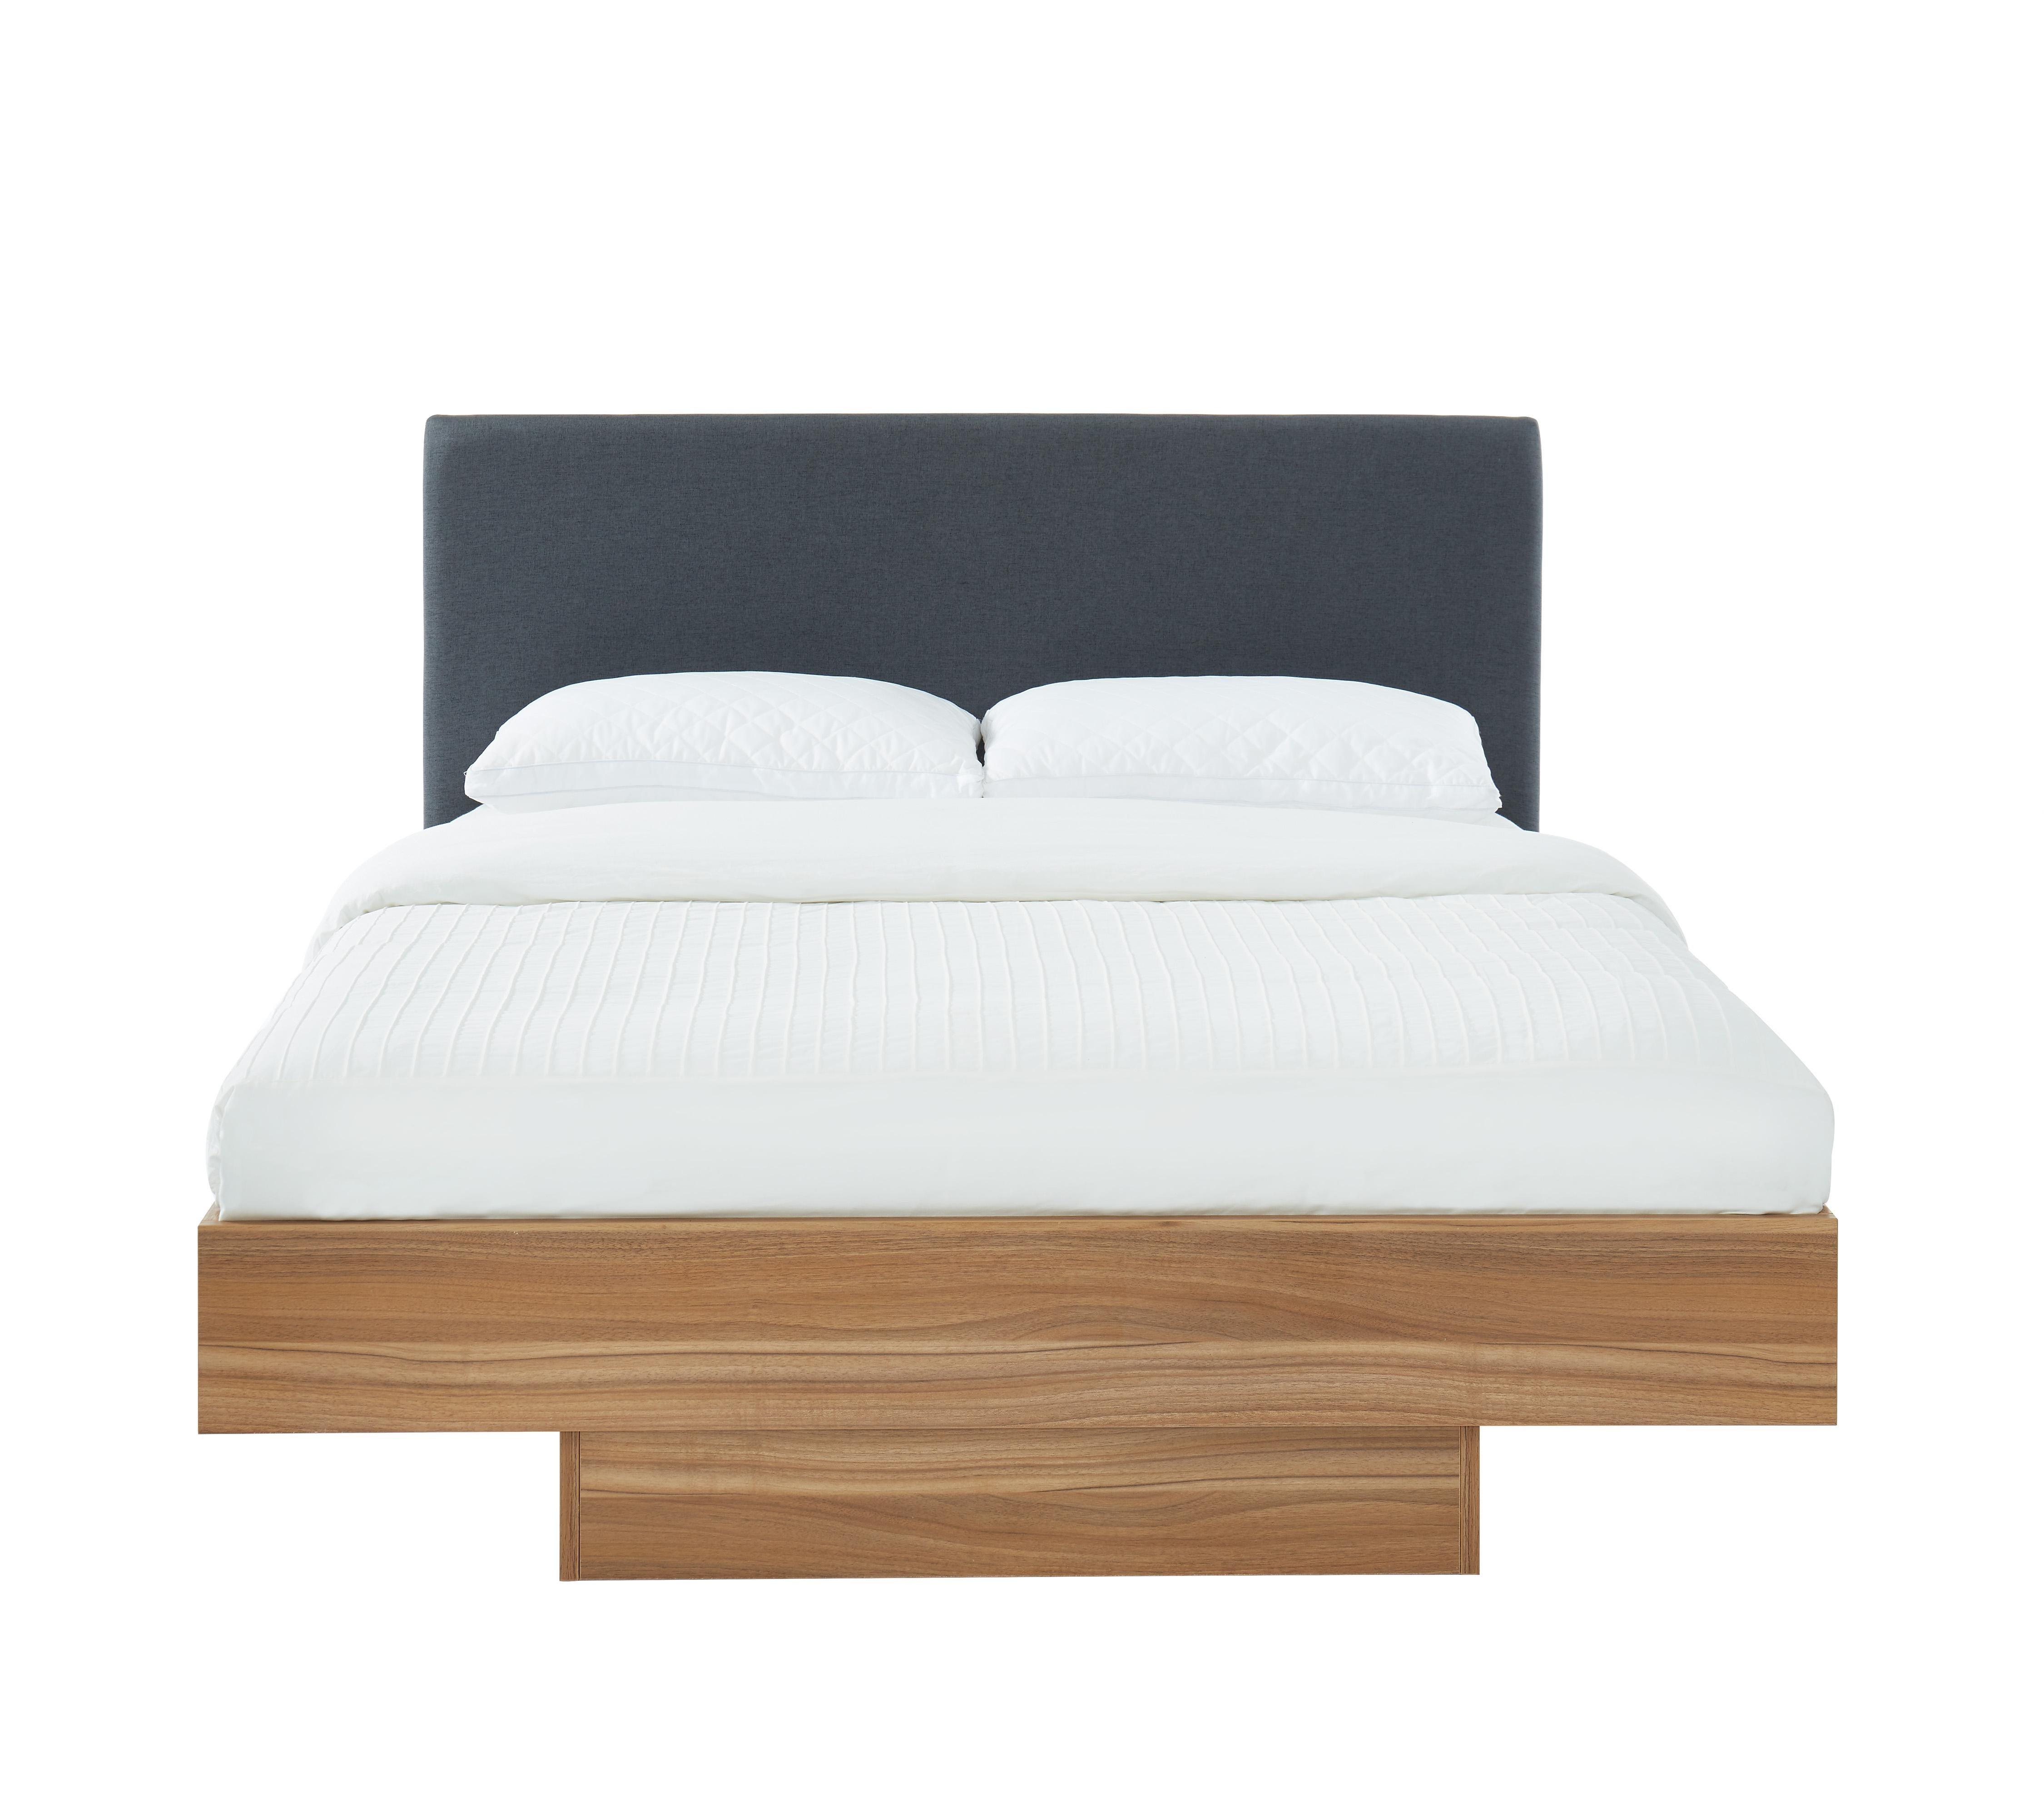 Wooden Floating Bed Frame Queen Walnut Oak Matt Blatt